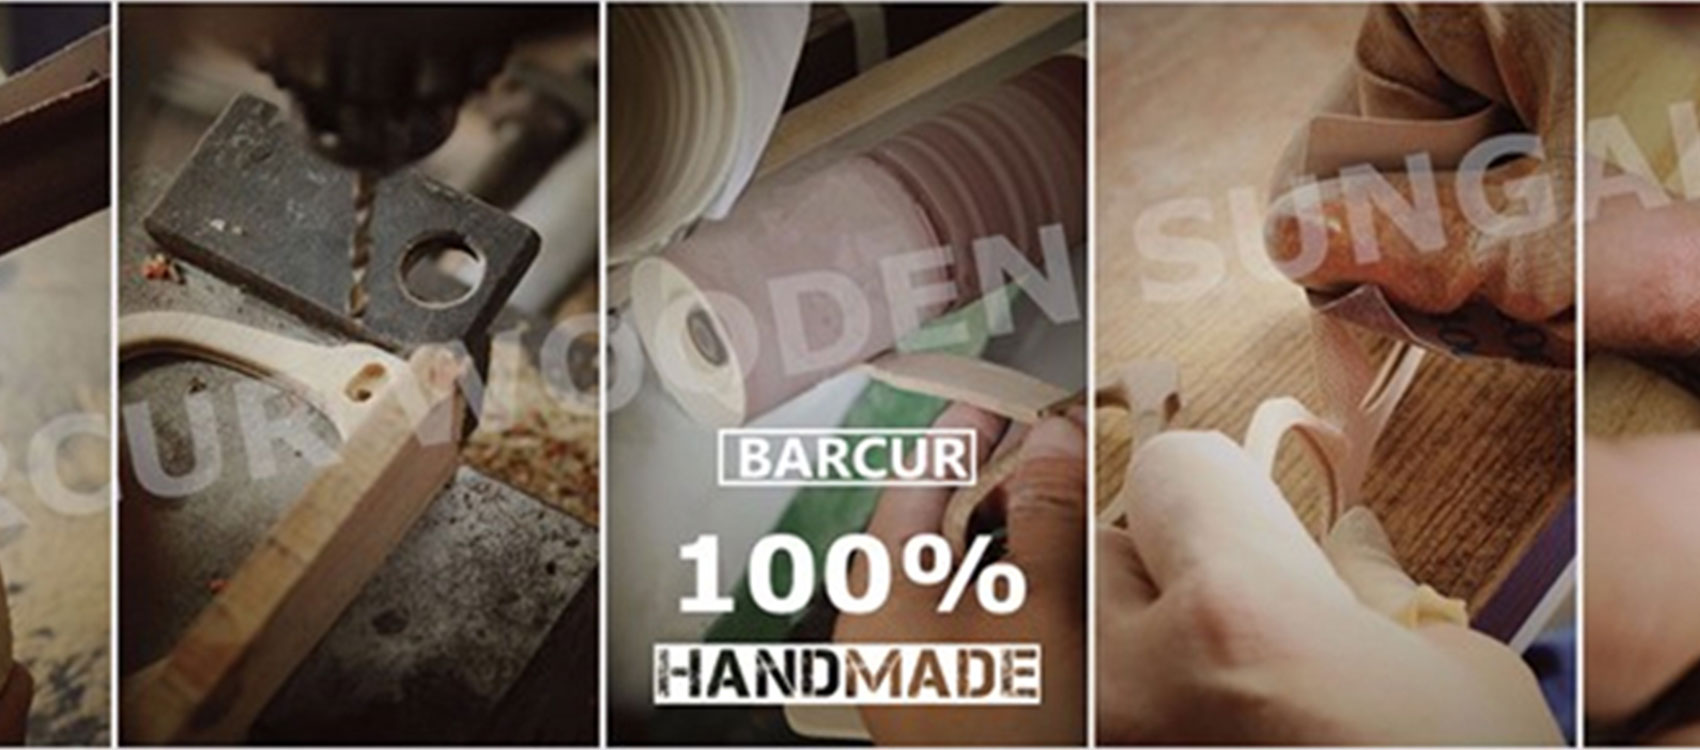 BARCUR-SUNGLASSES-BRAND